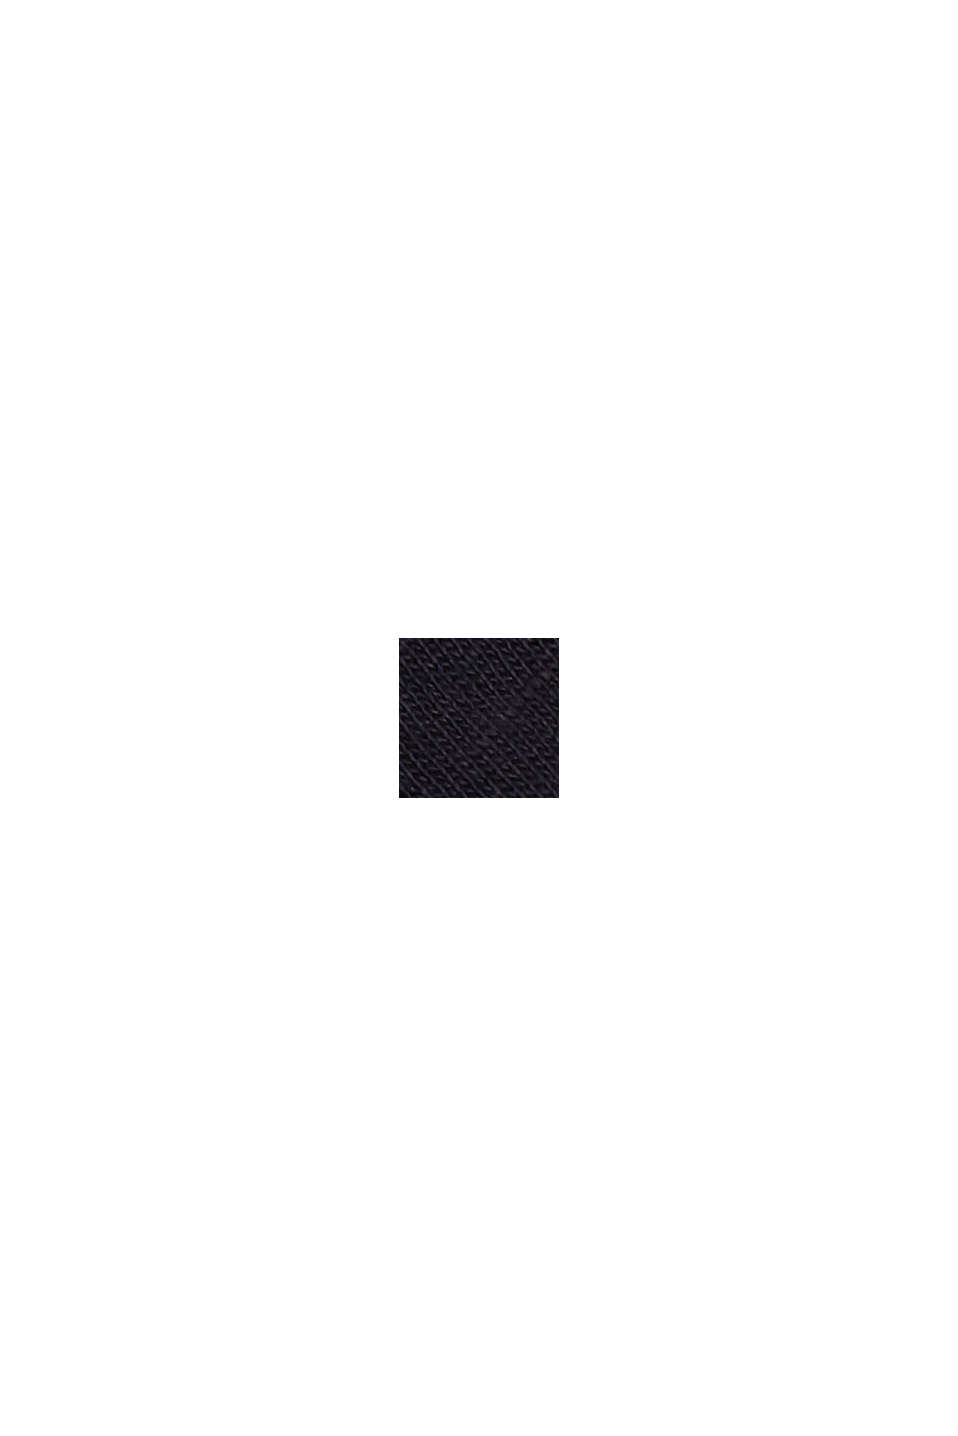 CURVY Longsleeve mit Streifen, Organic Cotton, NAVY, swatch